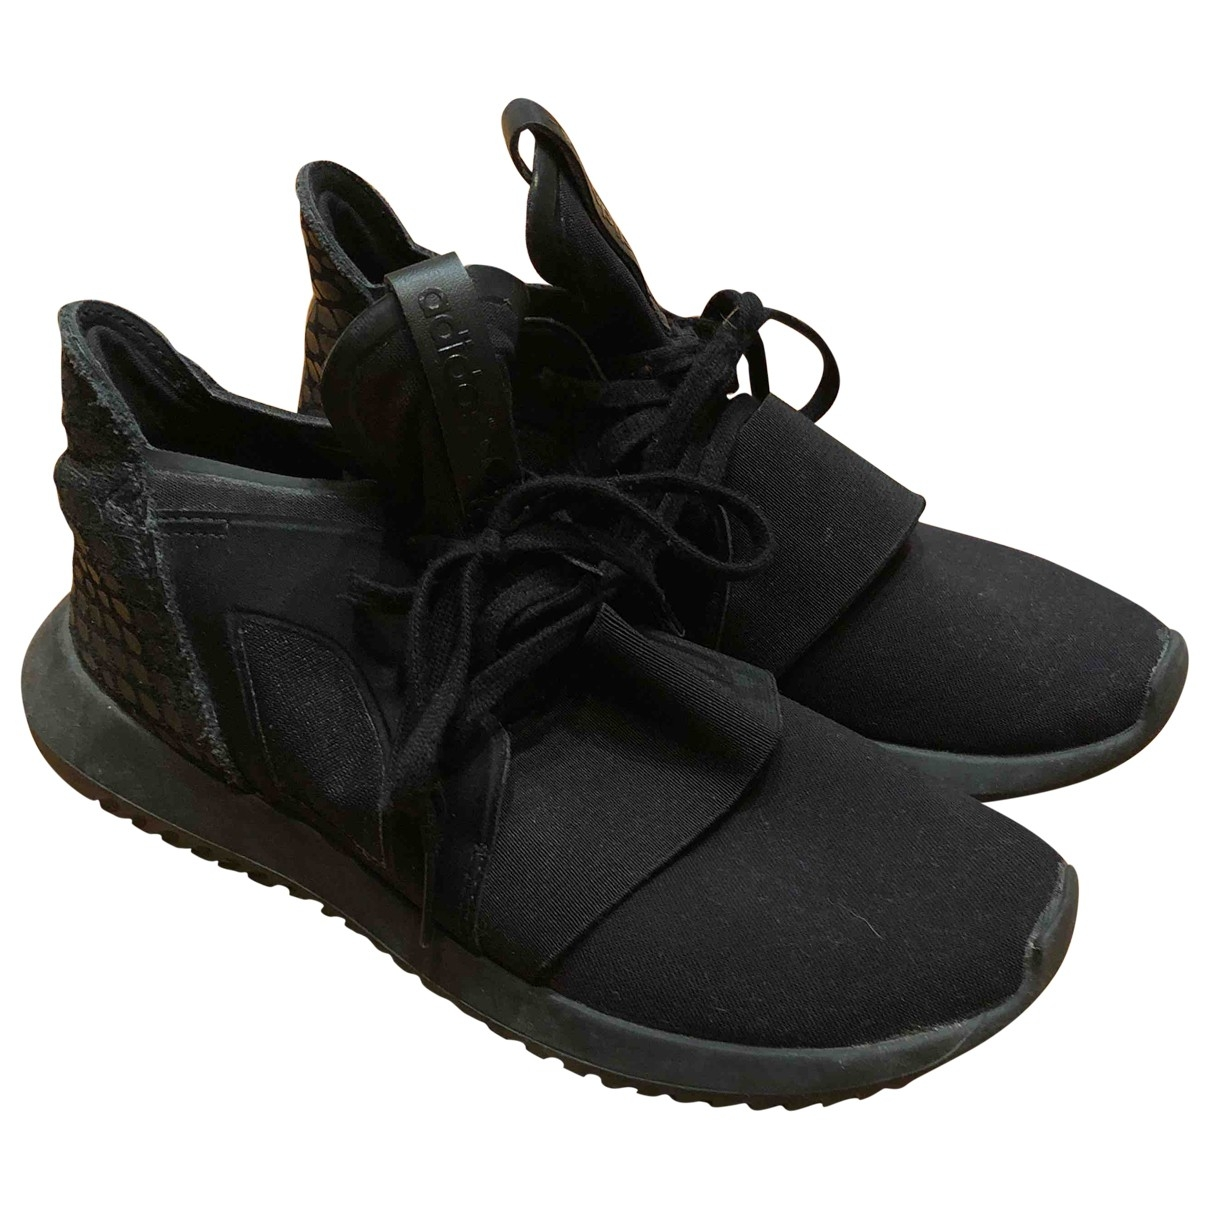 Adidas - Baskets Tubular pour femme - noir